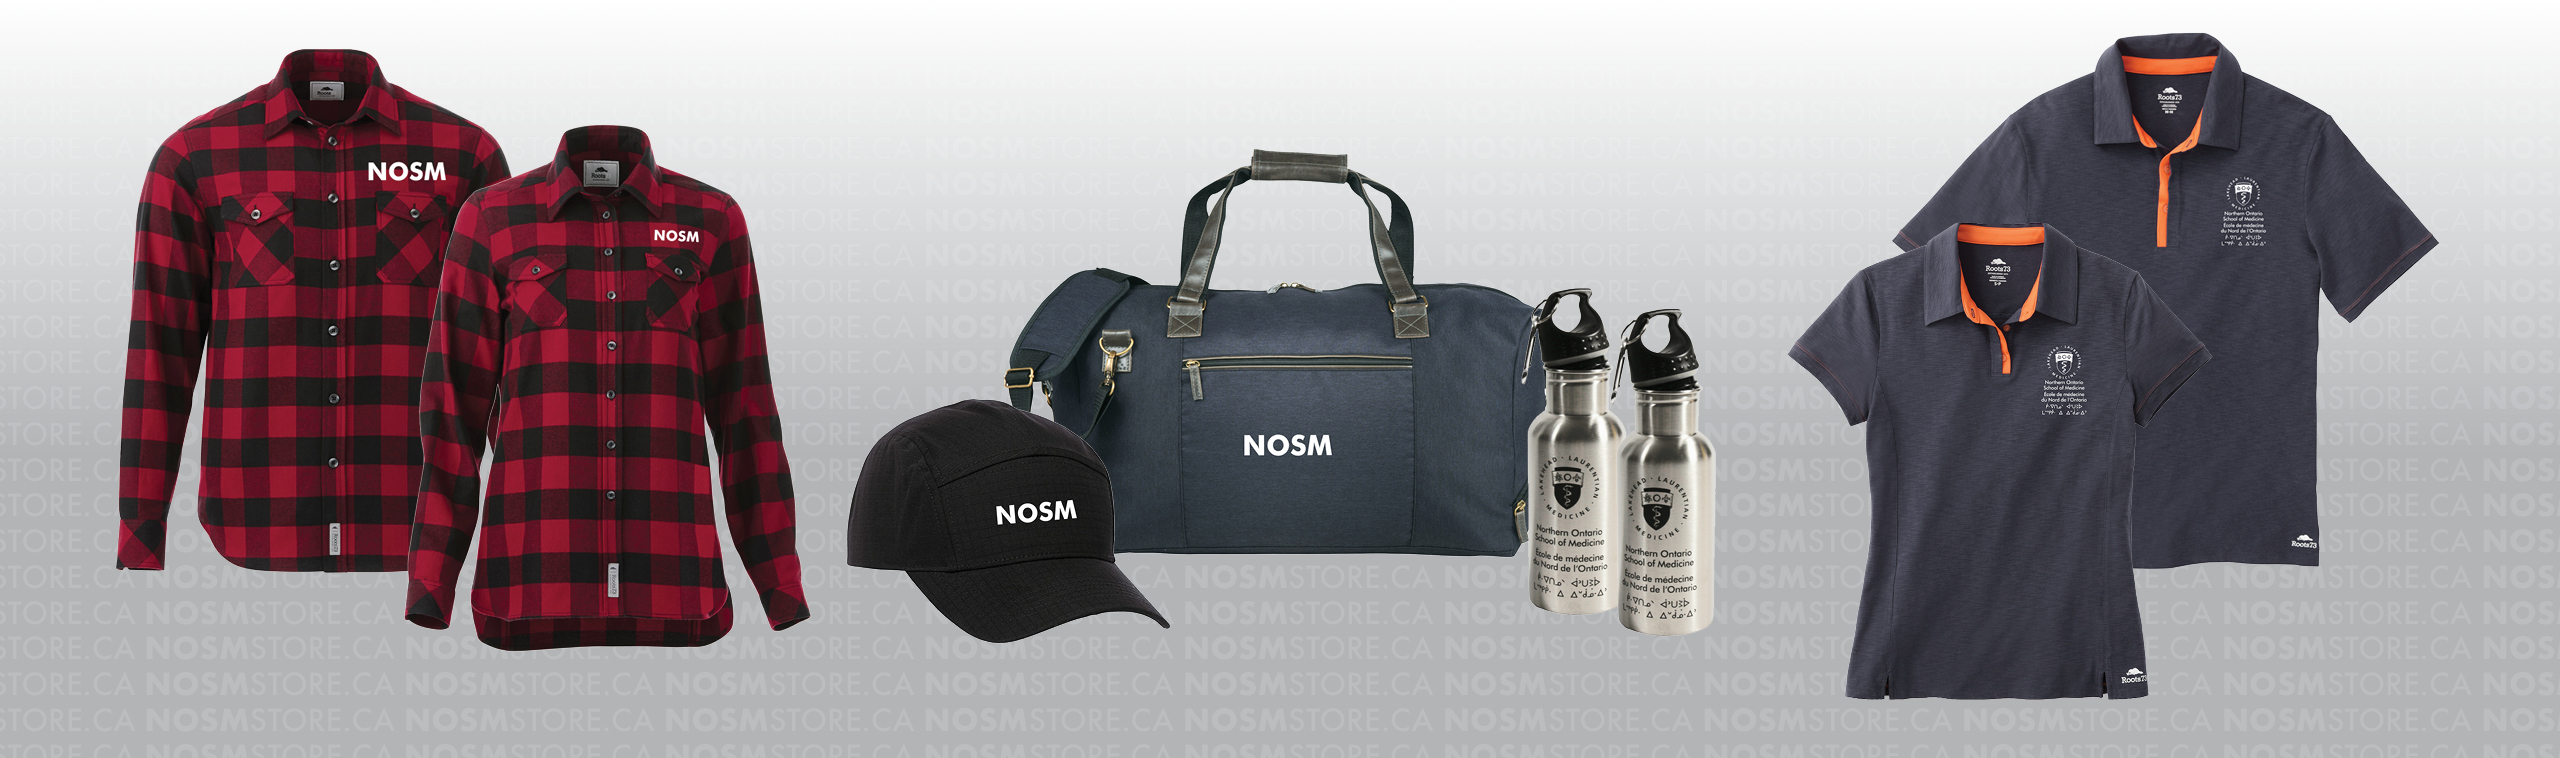 NOSM Online Store